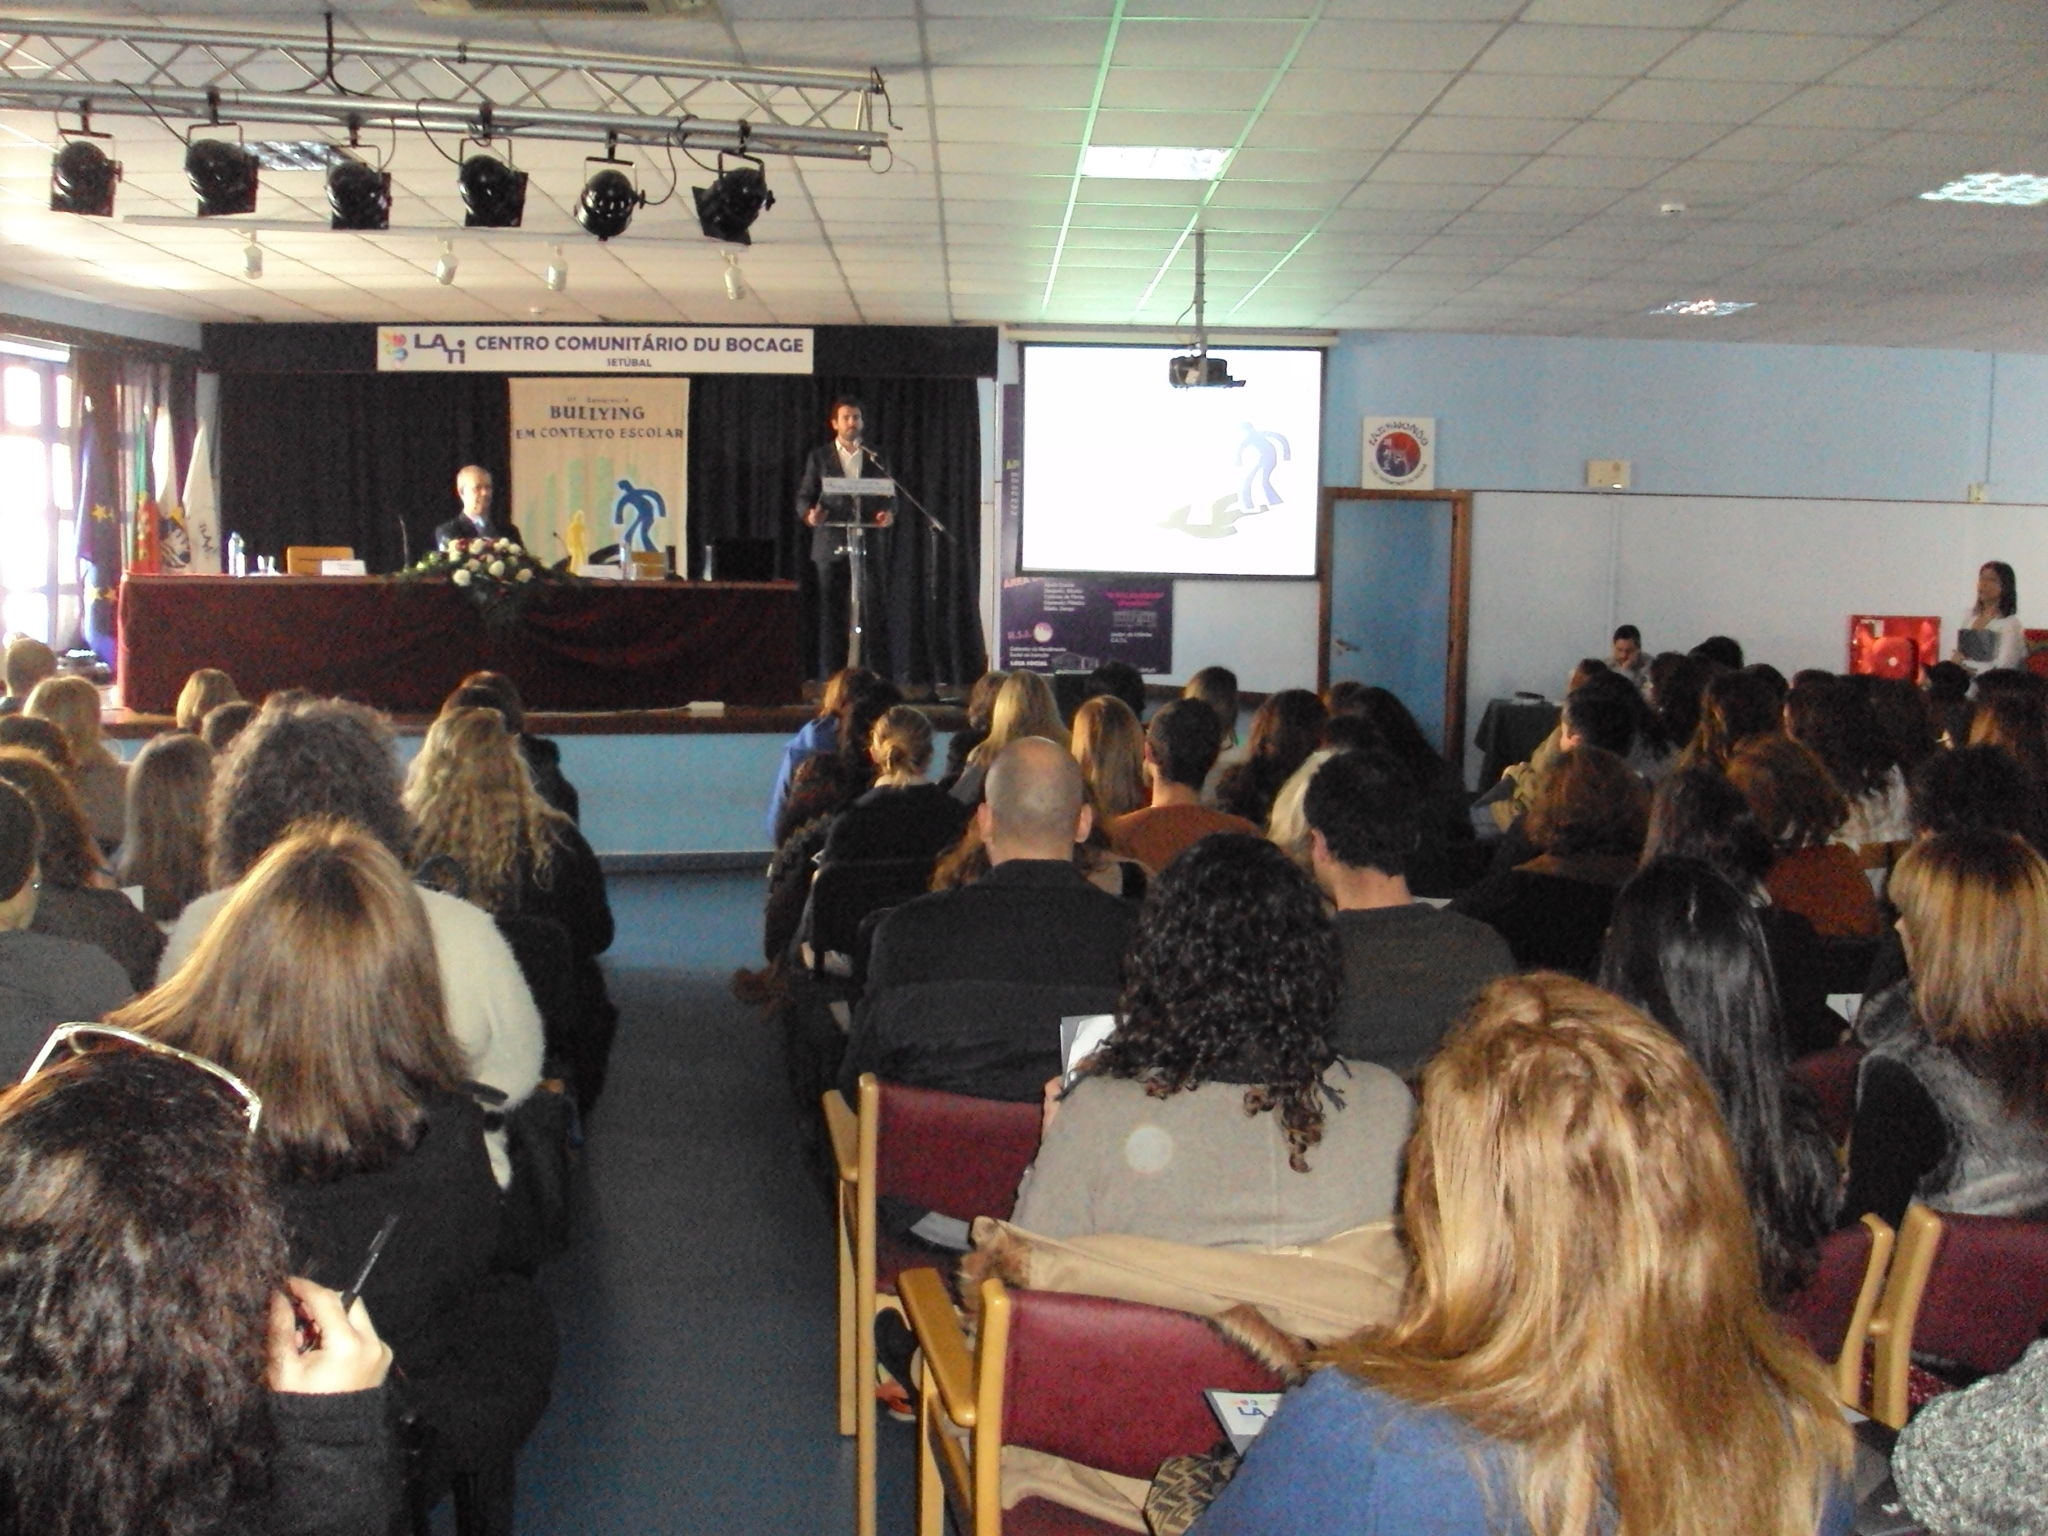 III Conferência Juventude – Bullying Em Contexto Escolar